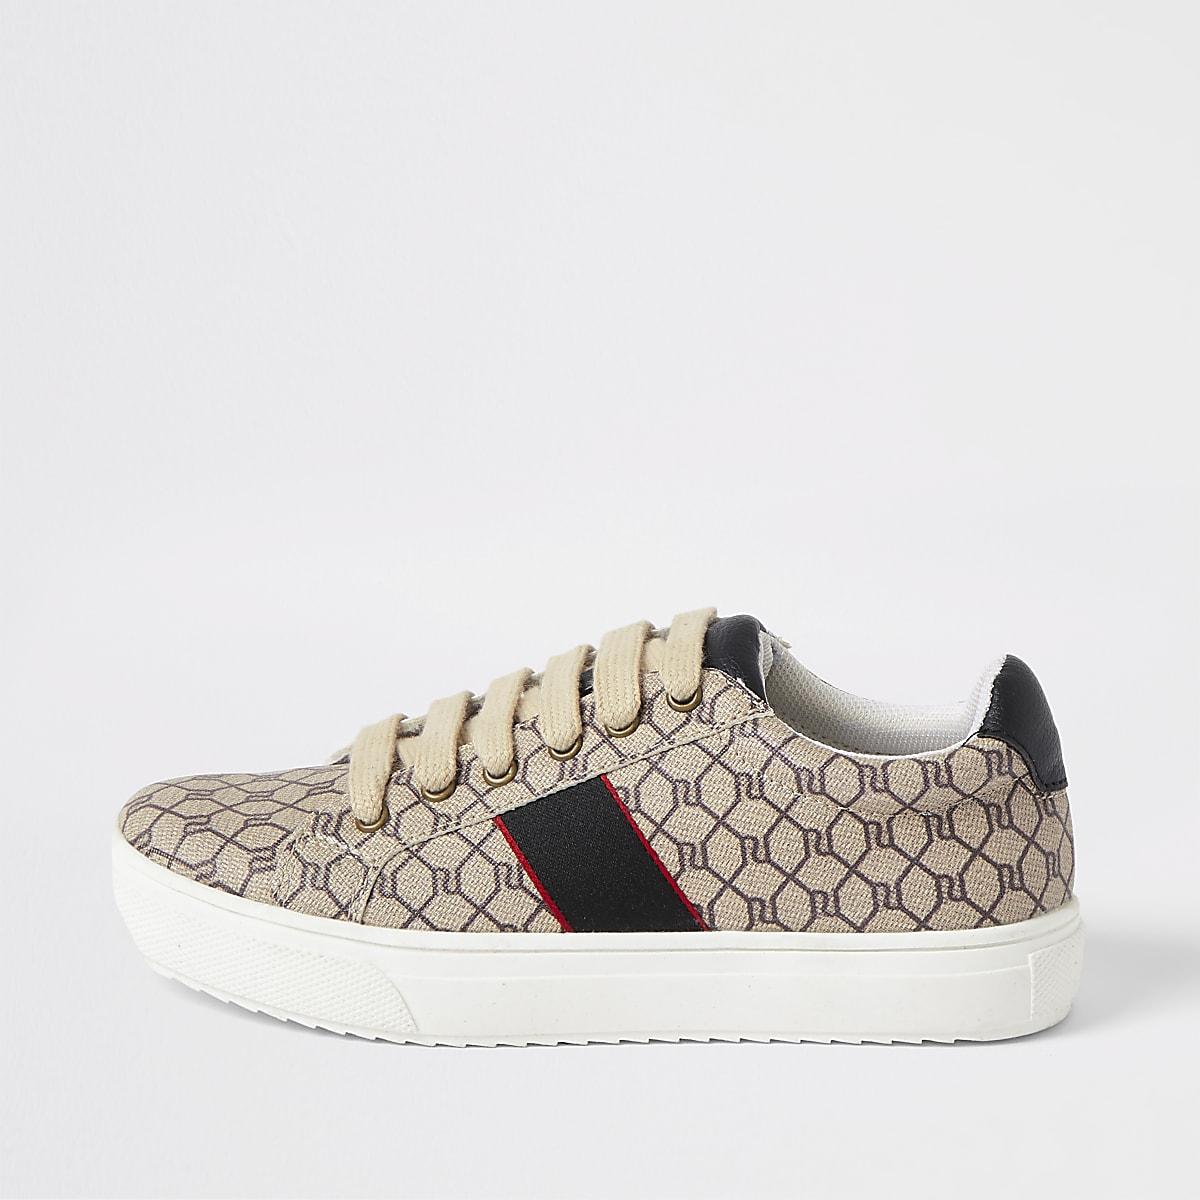 Braune Sneakers mit RI-Monogramm